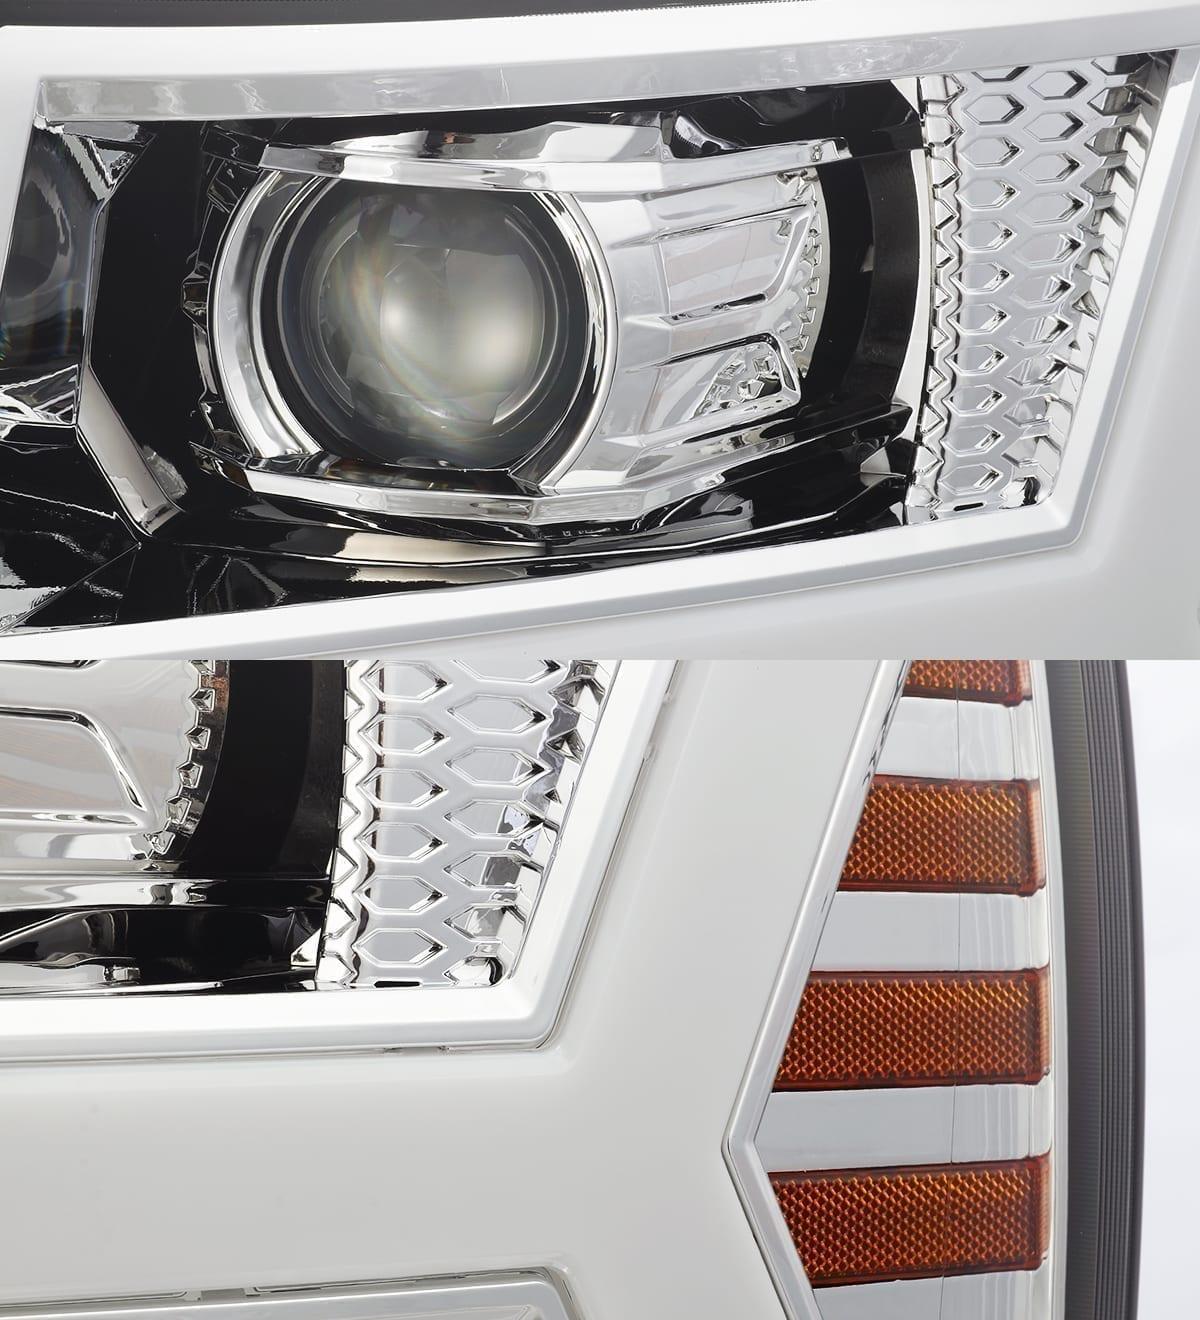 Chrome 2007 2008 2009 2010 2011 2012 2013 Chevrolet Silverado PRO-Series Projector Headlights